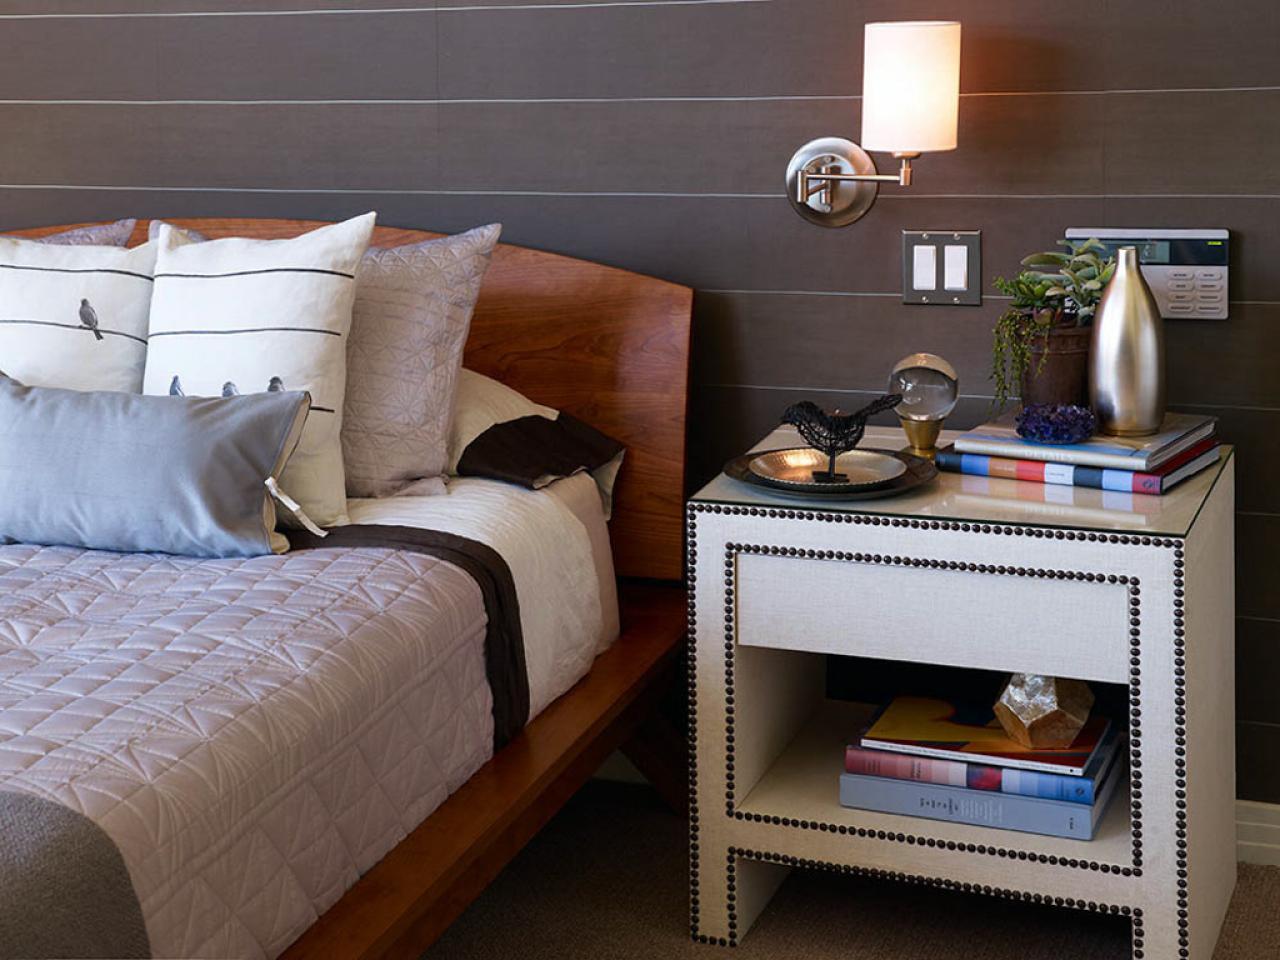 bedside reading lamp